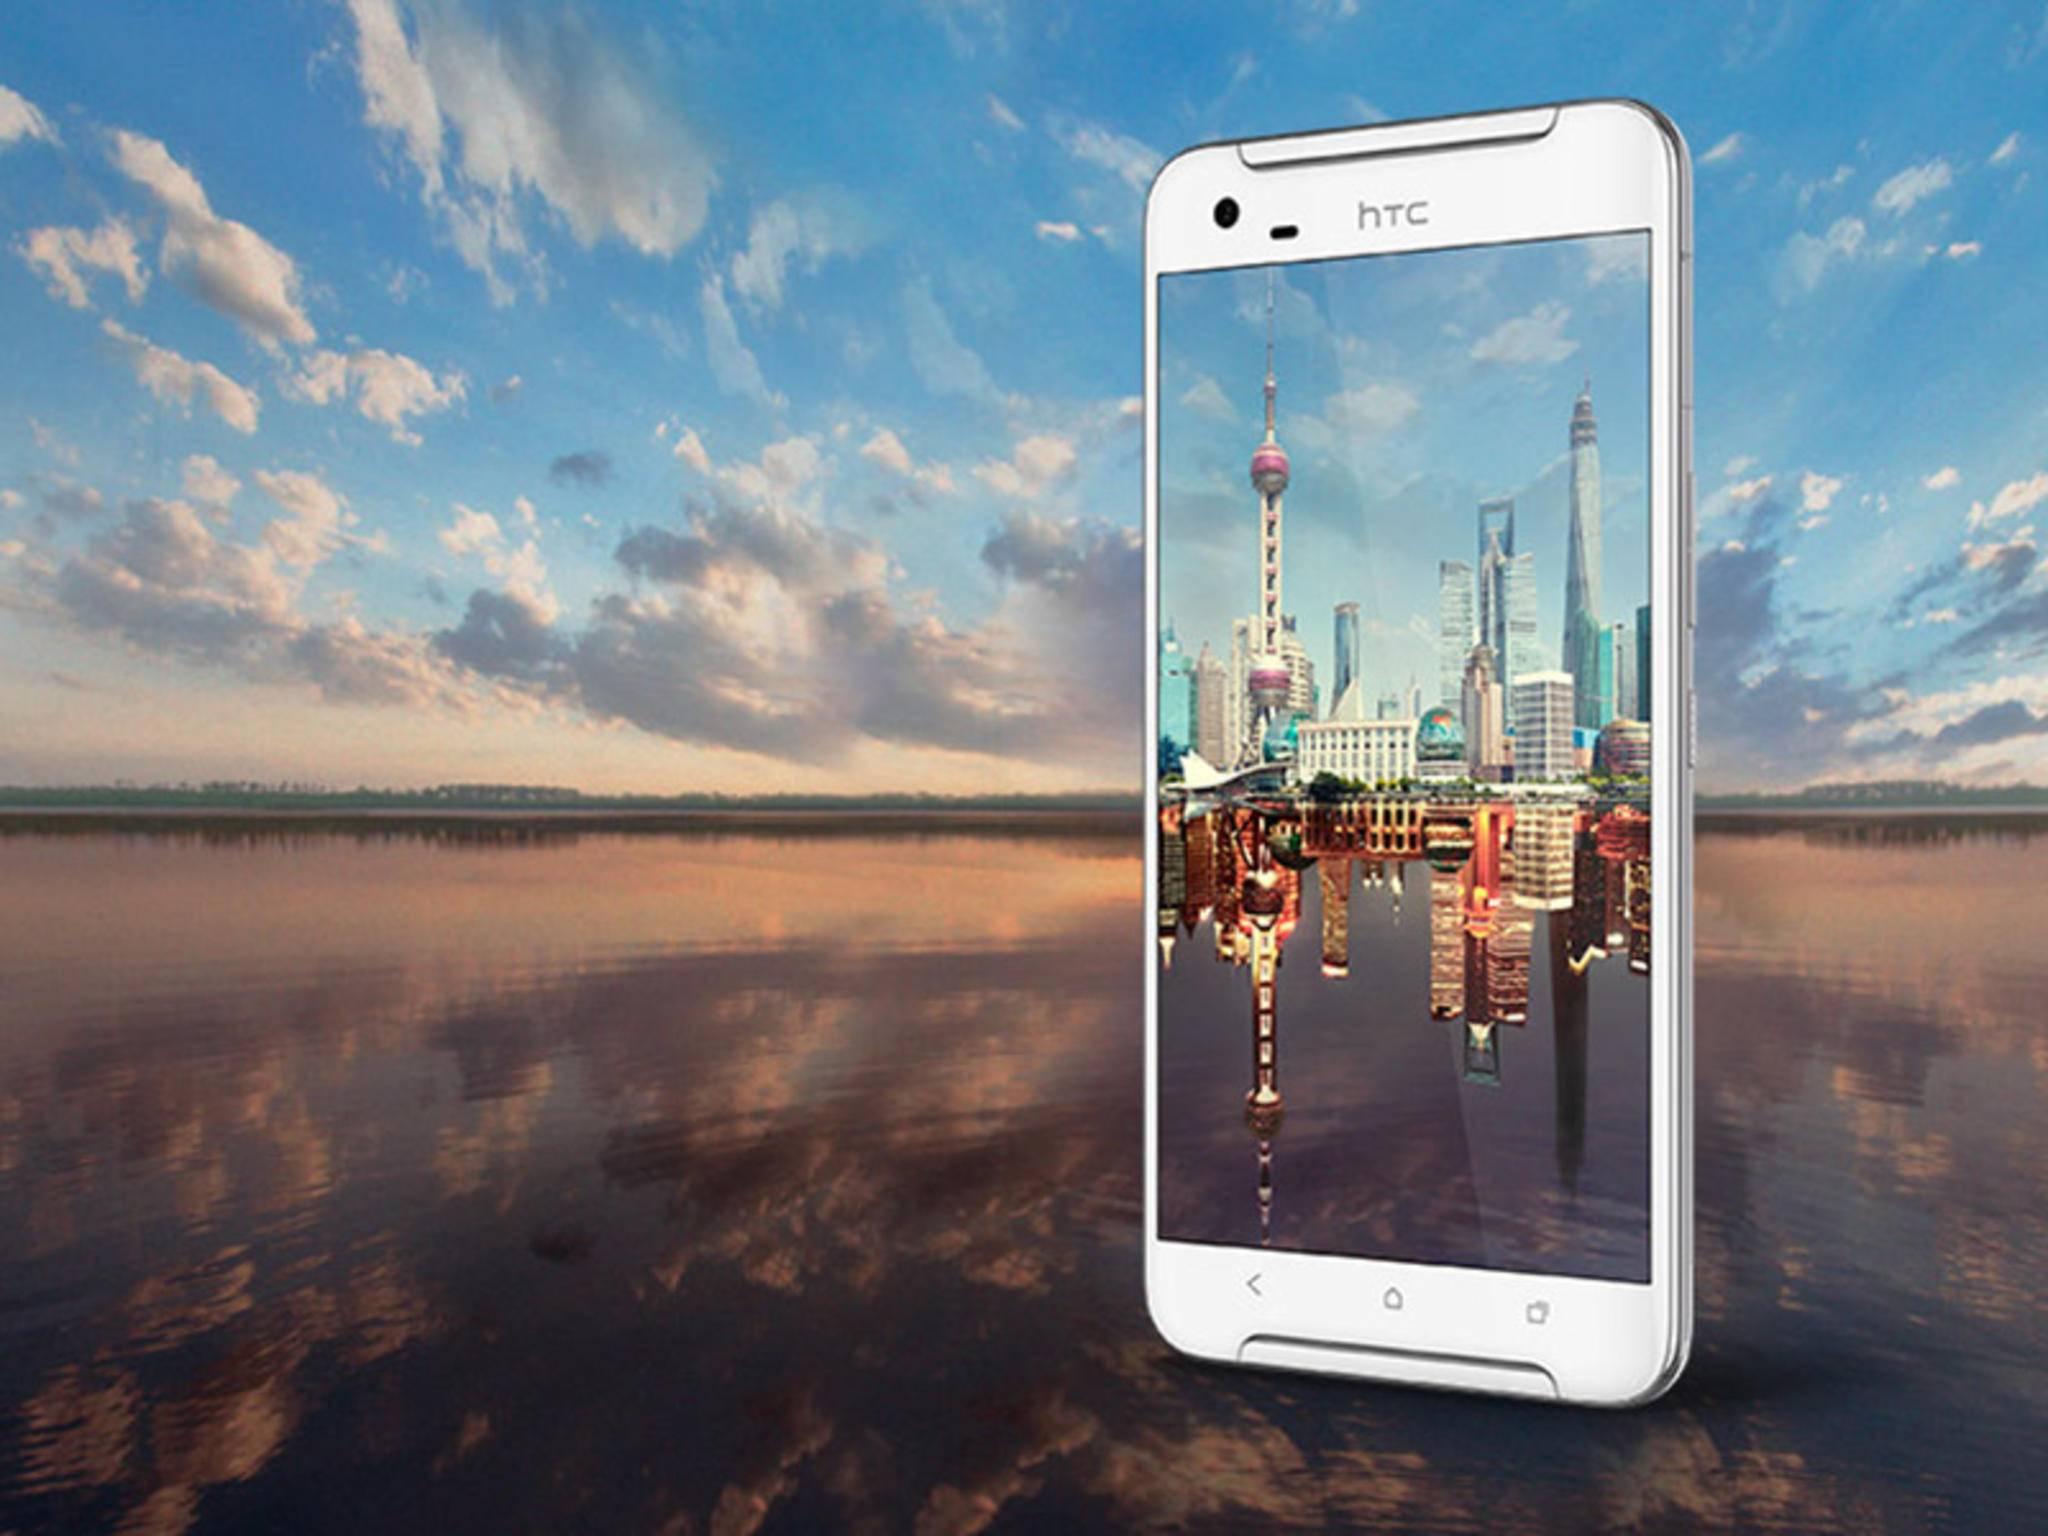 Mittelklasse-Smartphone HTC One X9 offiziell enthüllt